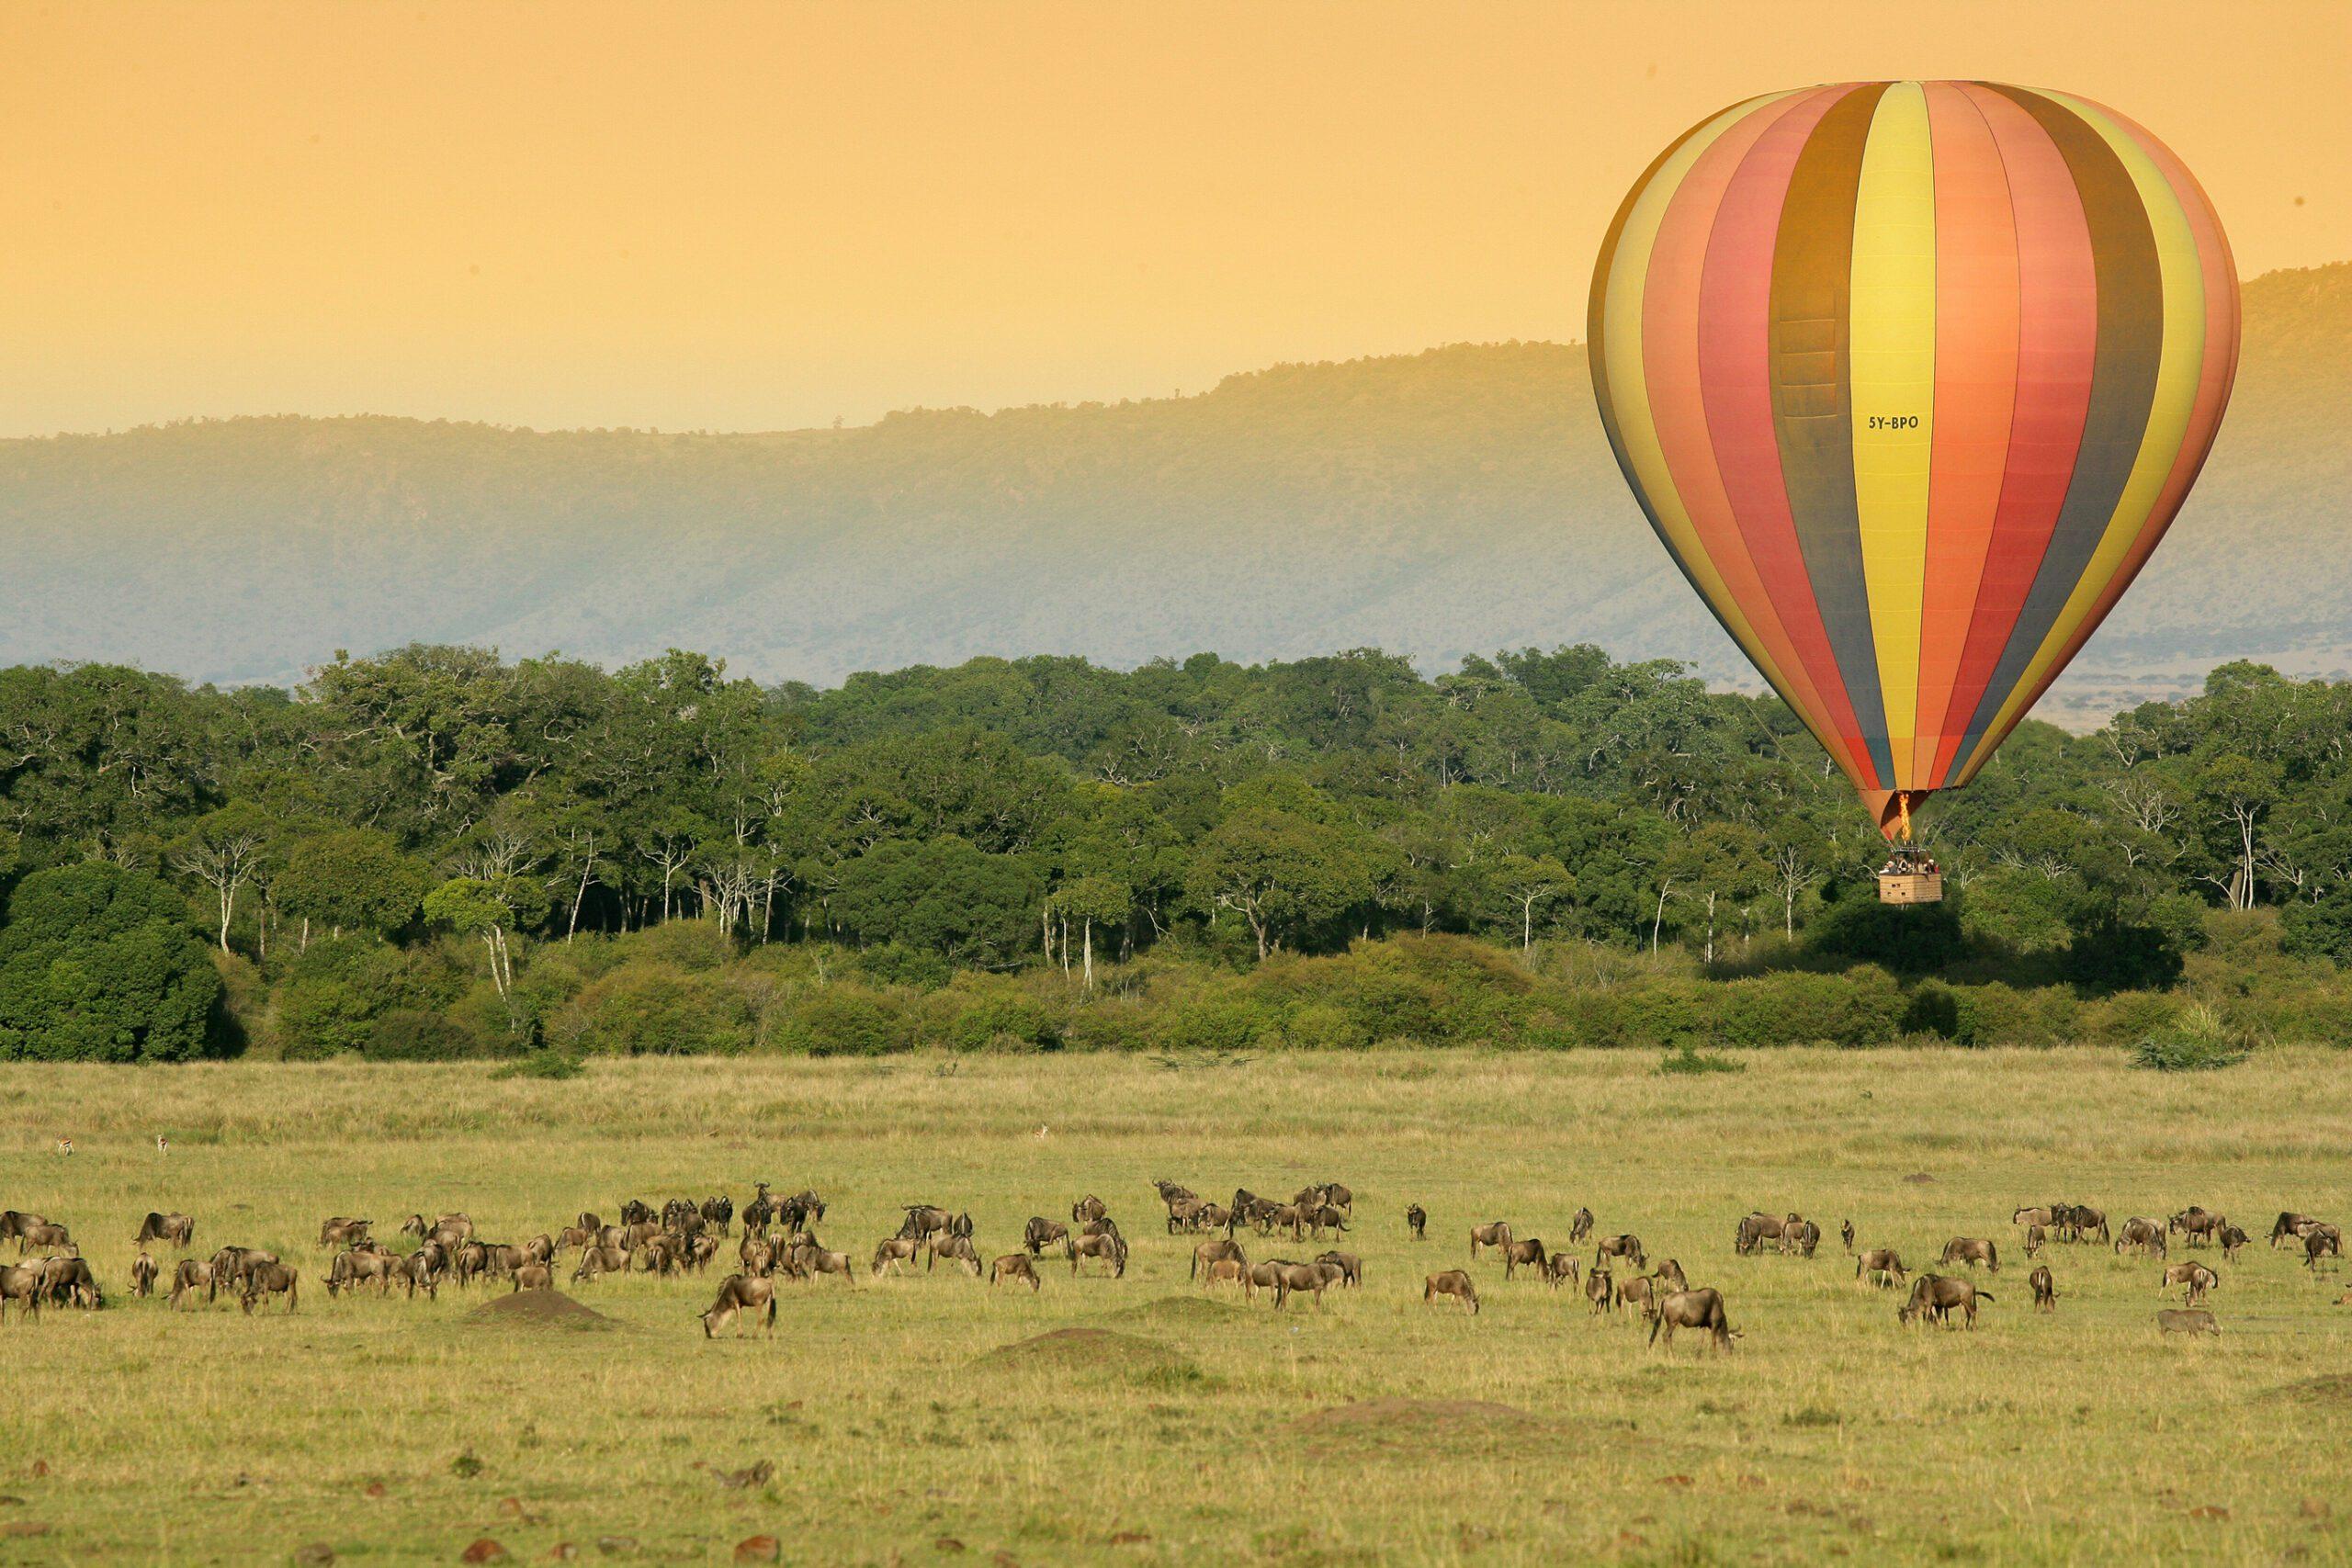 Governor's Camp - Maasai Mara, Kenya balloon safari